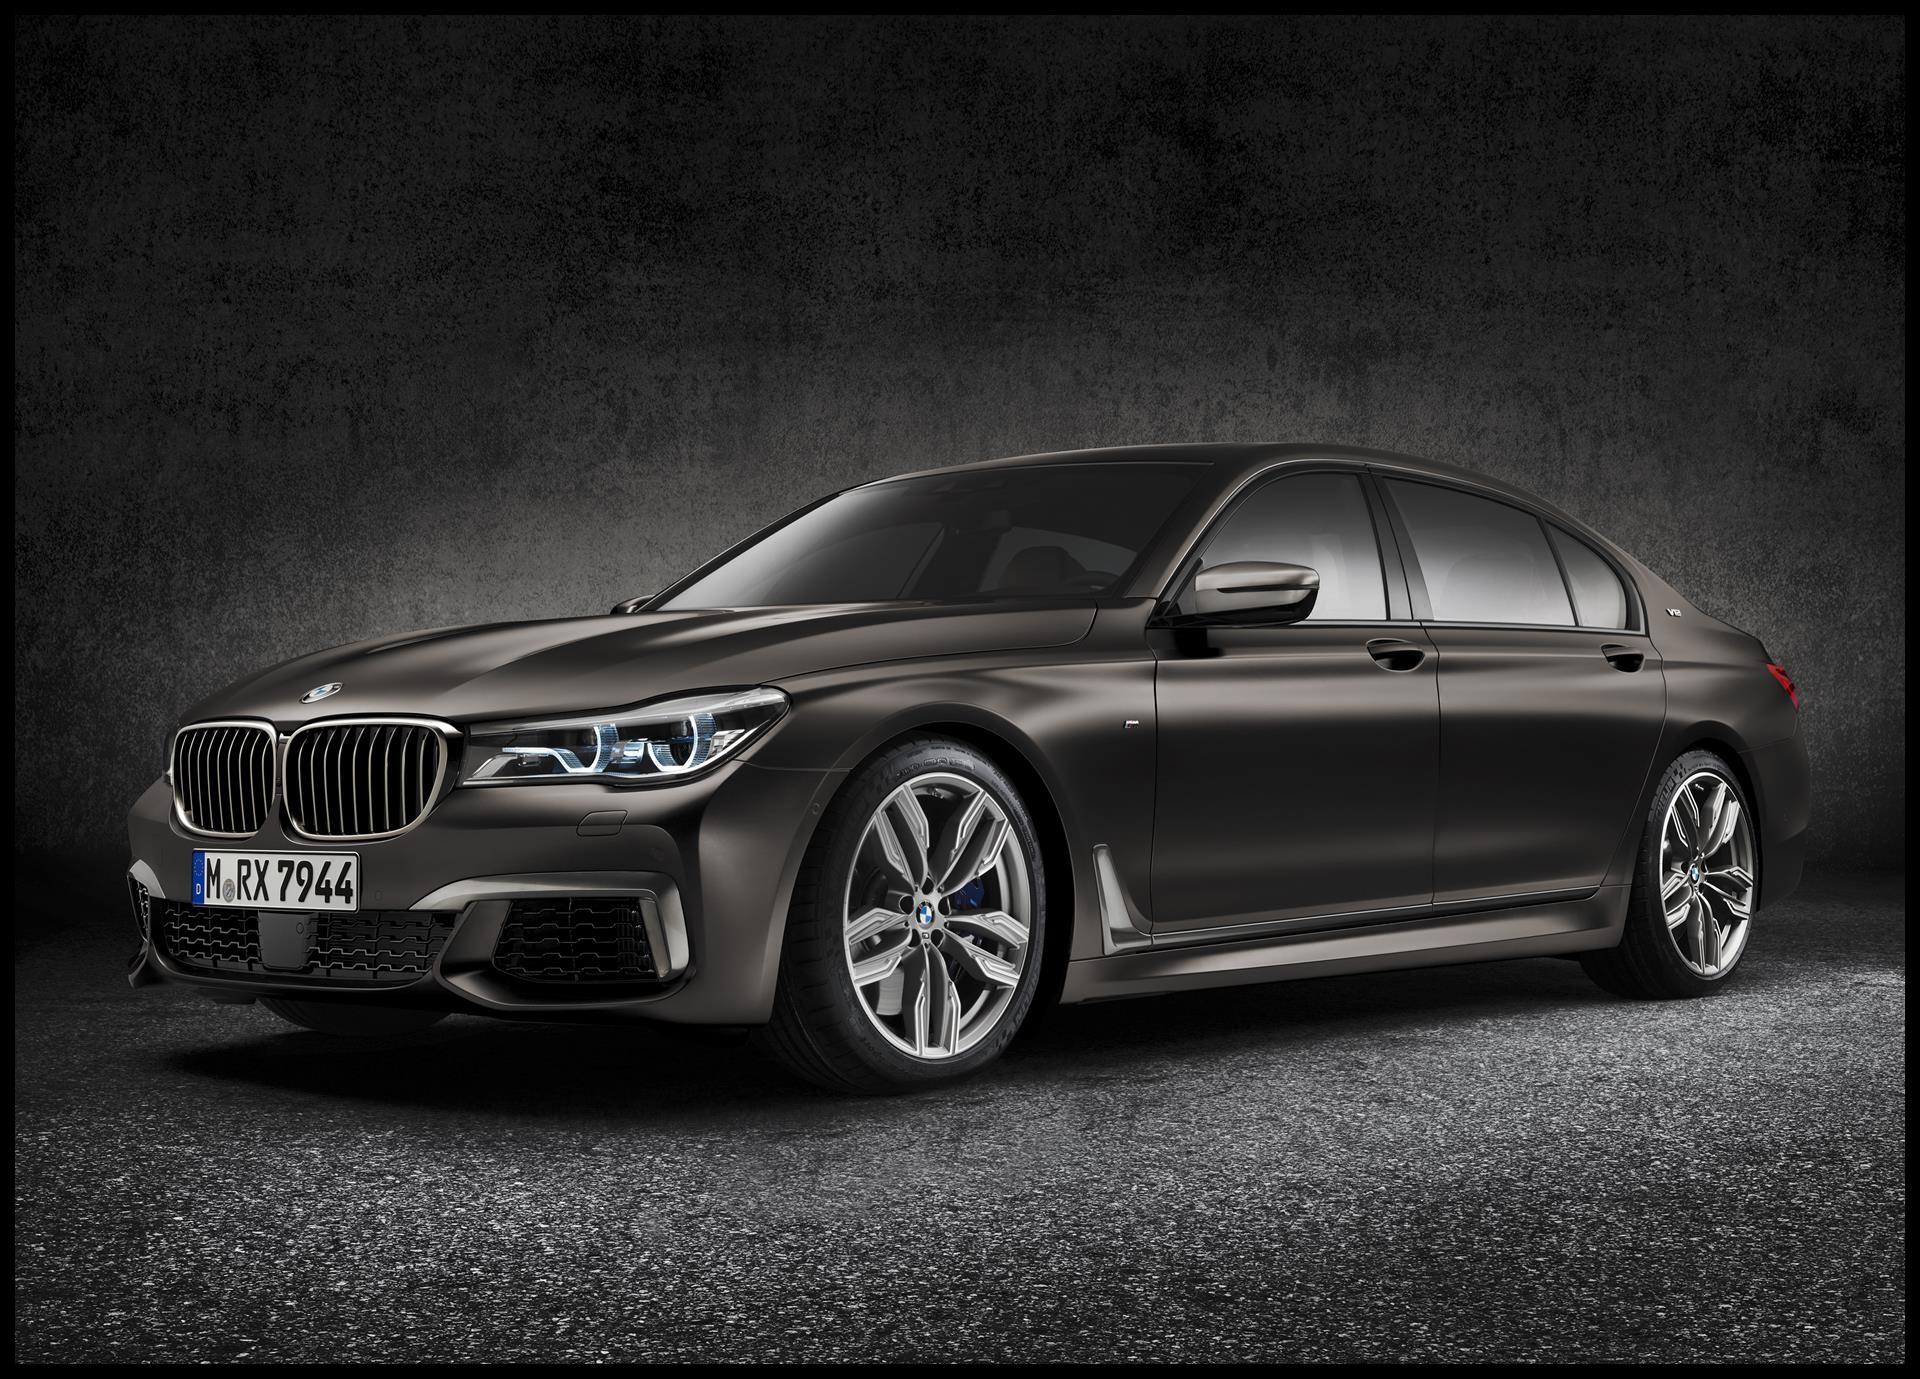 2017 BMW M760i xDrive image 01